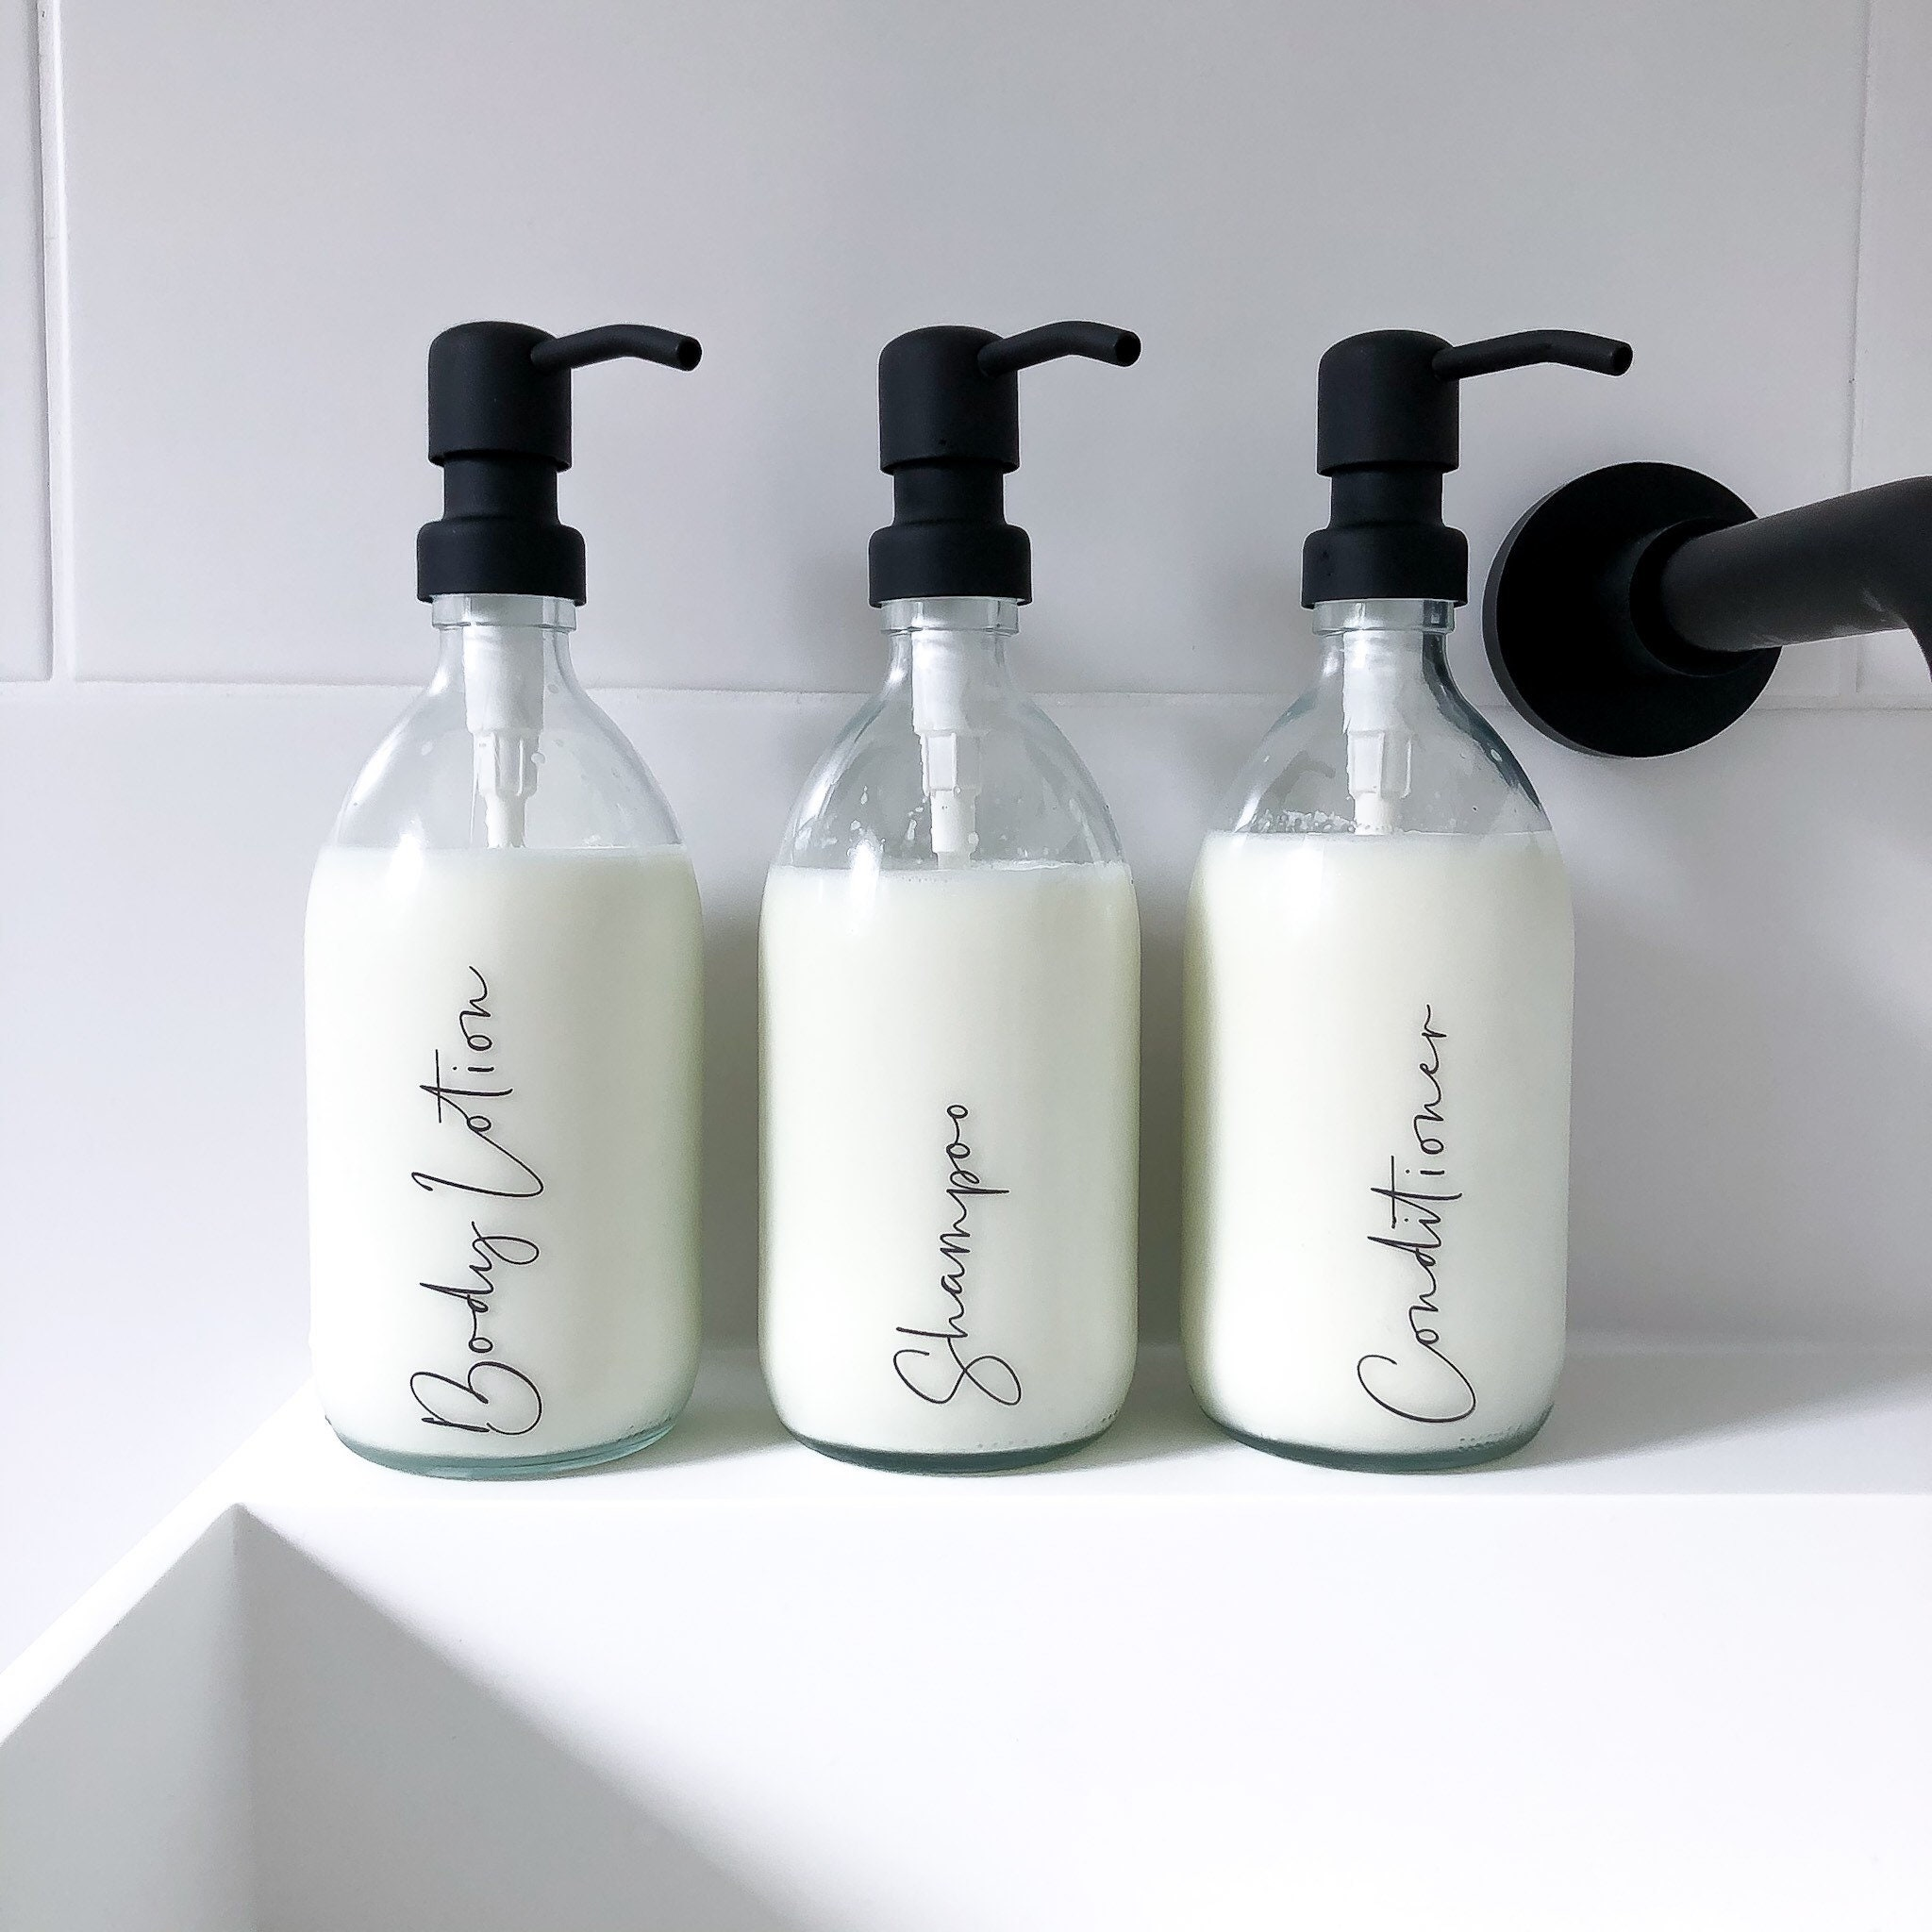 500ml Recycled Plastic Bathroom Soap, Bathroom Soap Dispensers